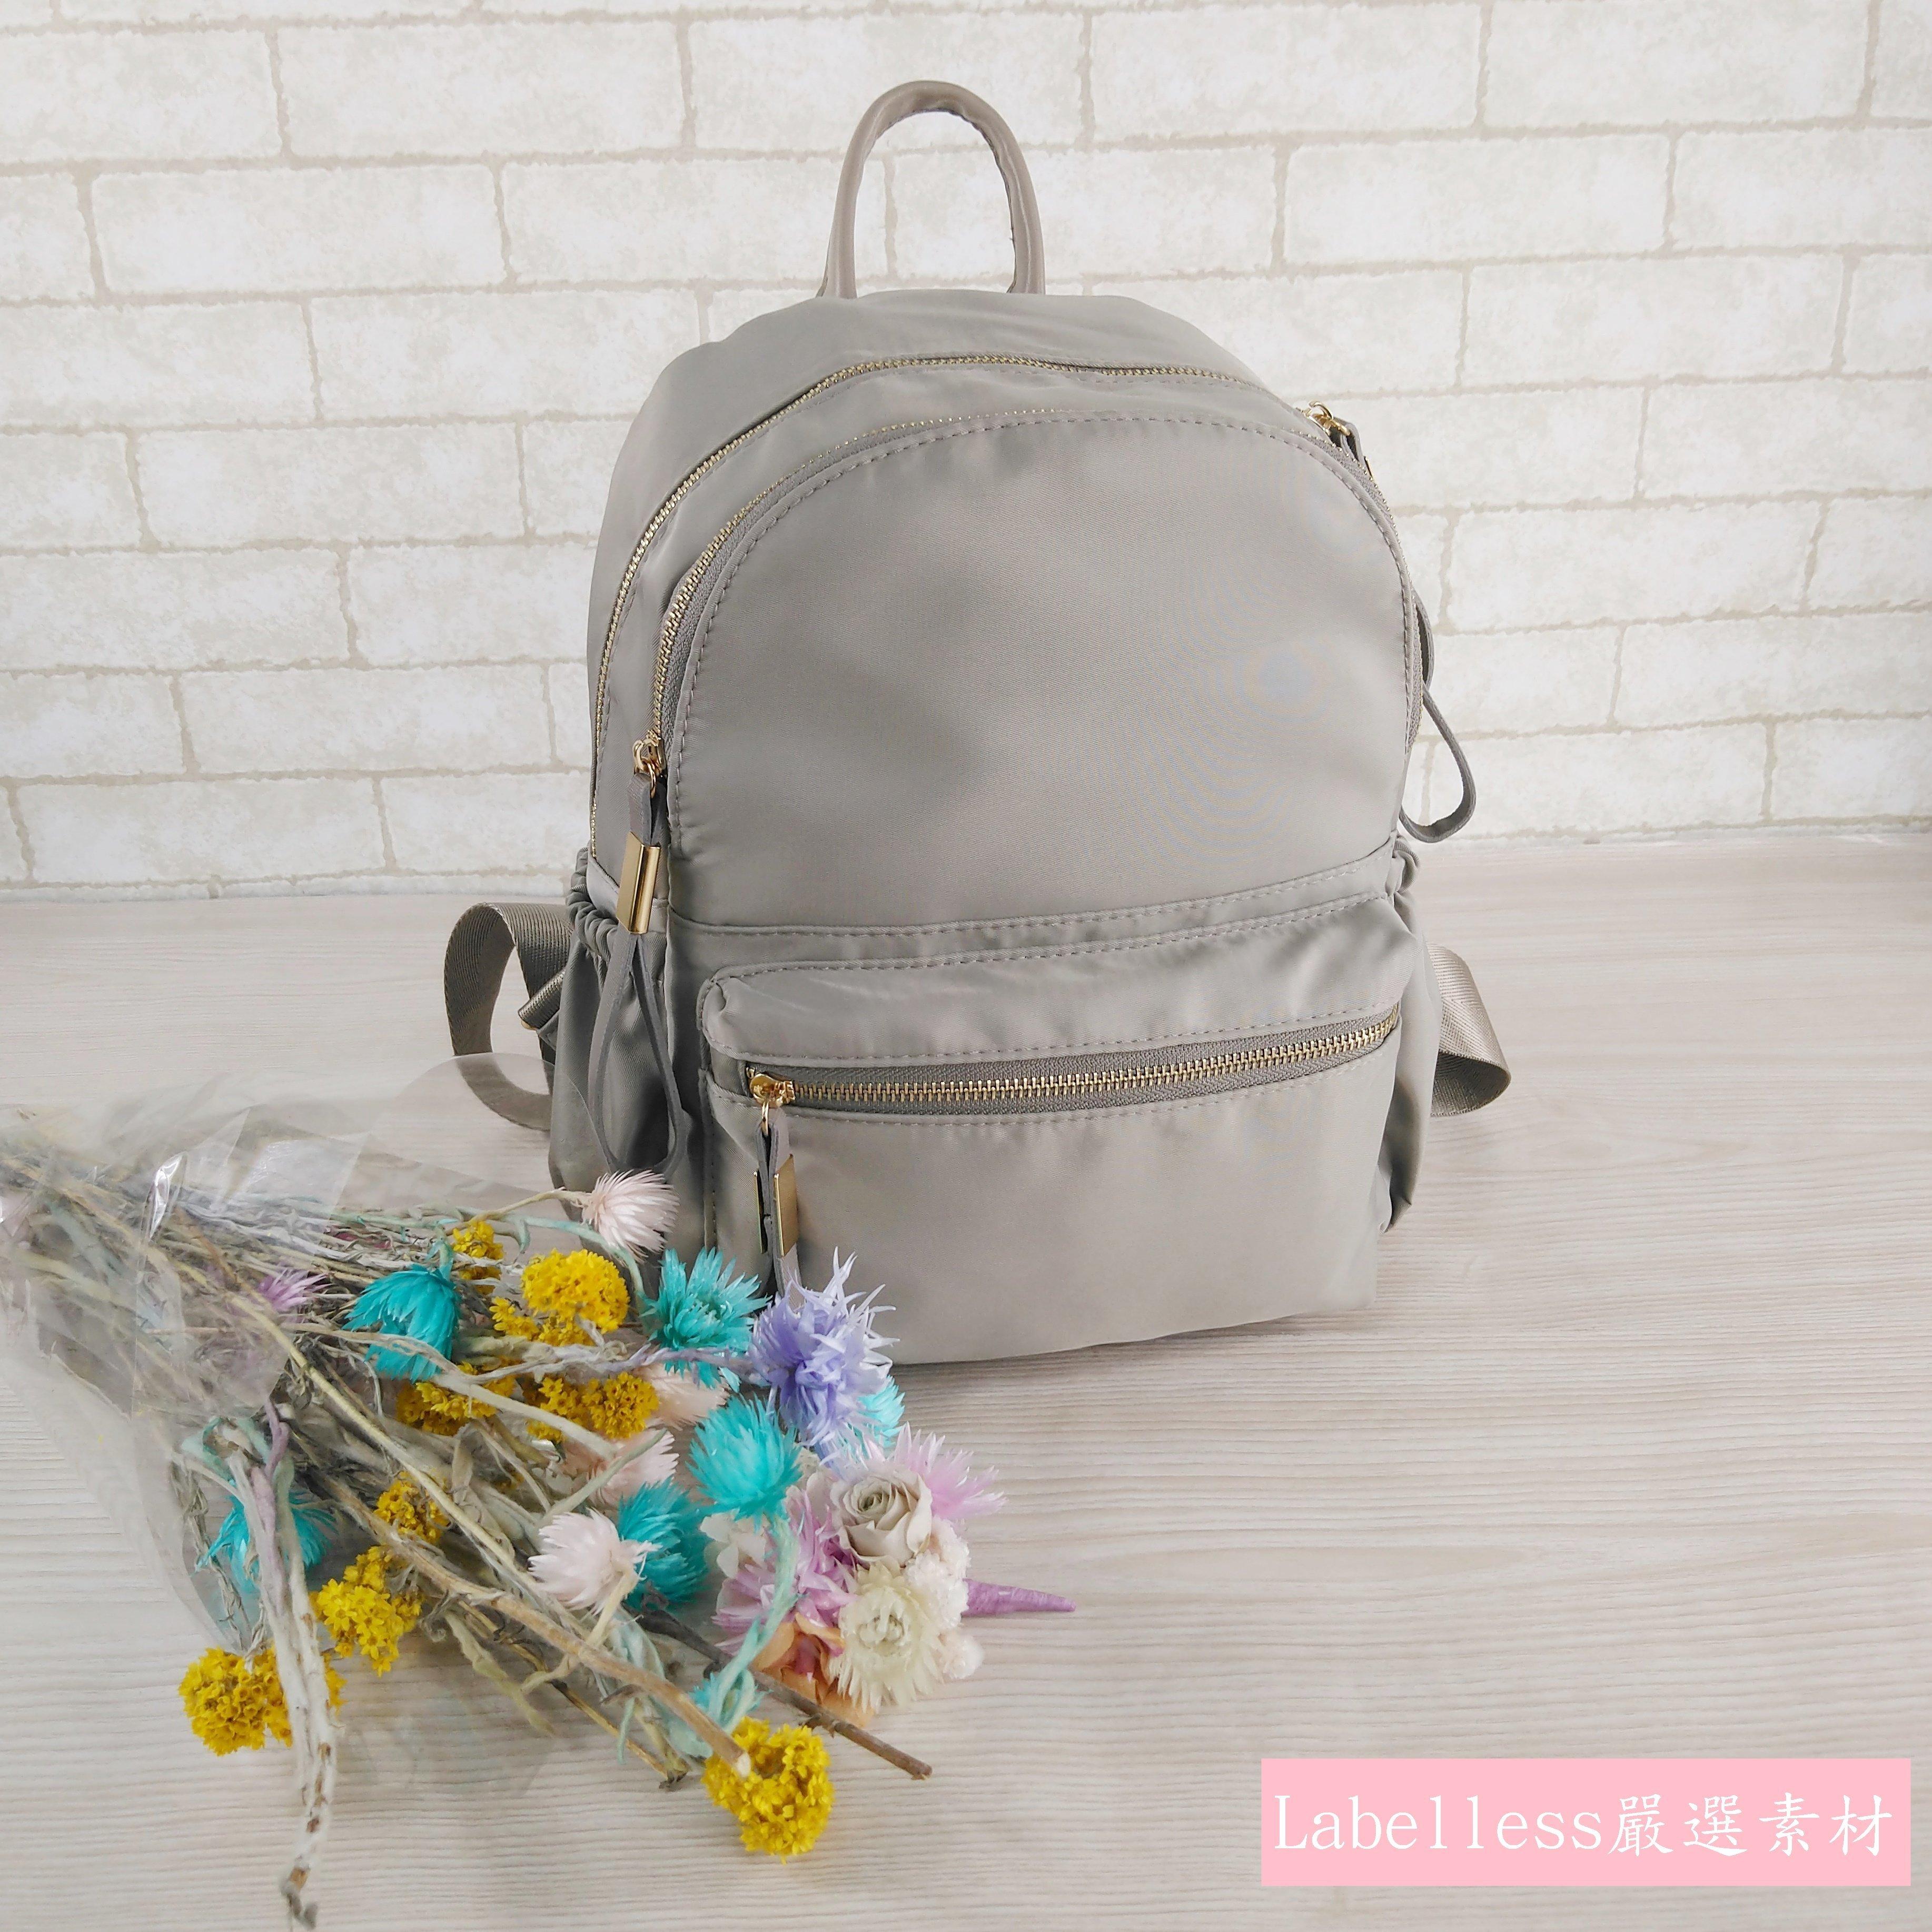 【Labelless小舖】 新灰色包款.源自淑女的魅力.強調 素材.簡約 .純淨風格. 包款.女用後背包